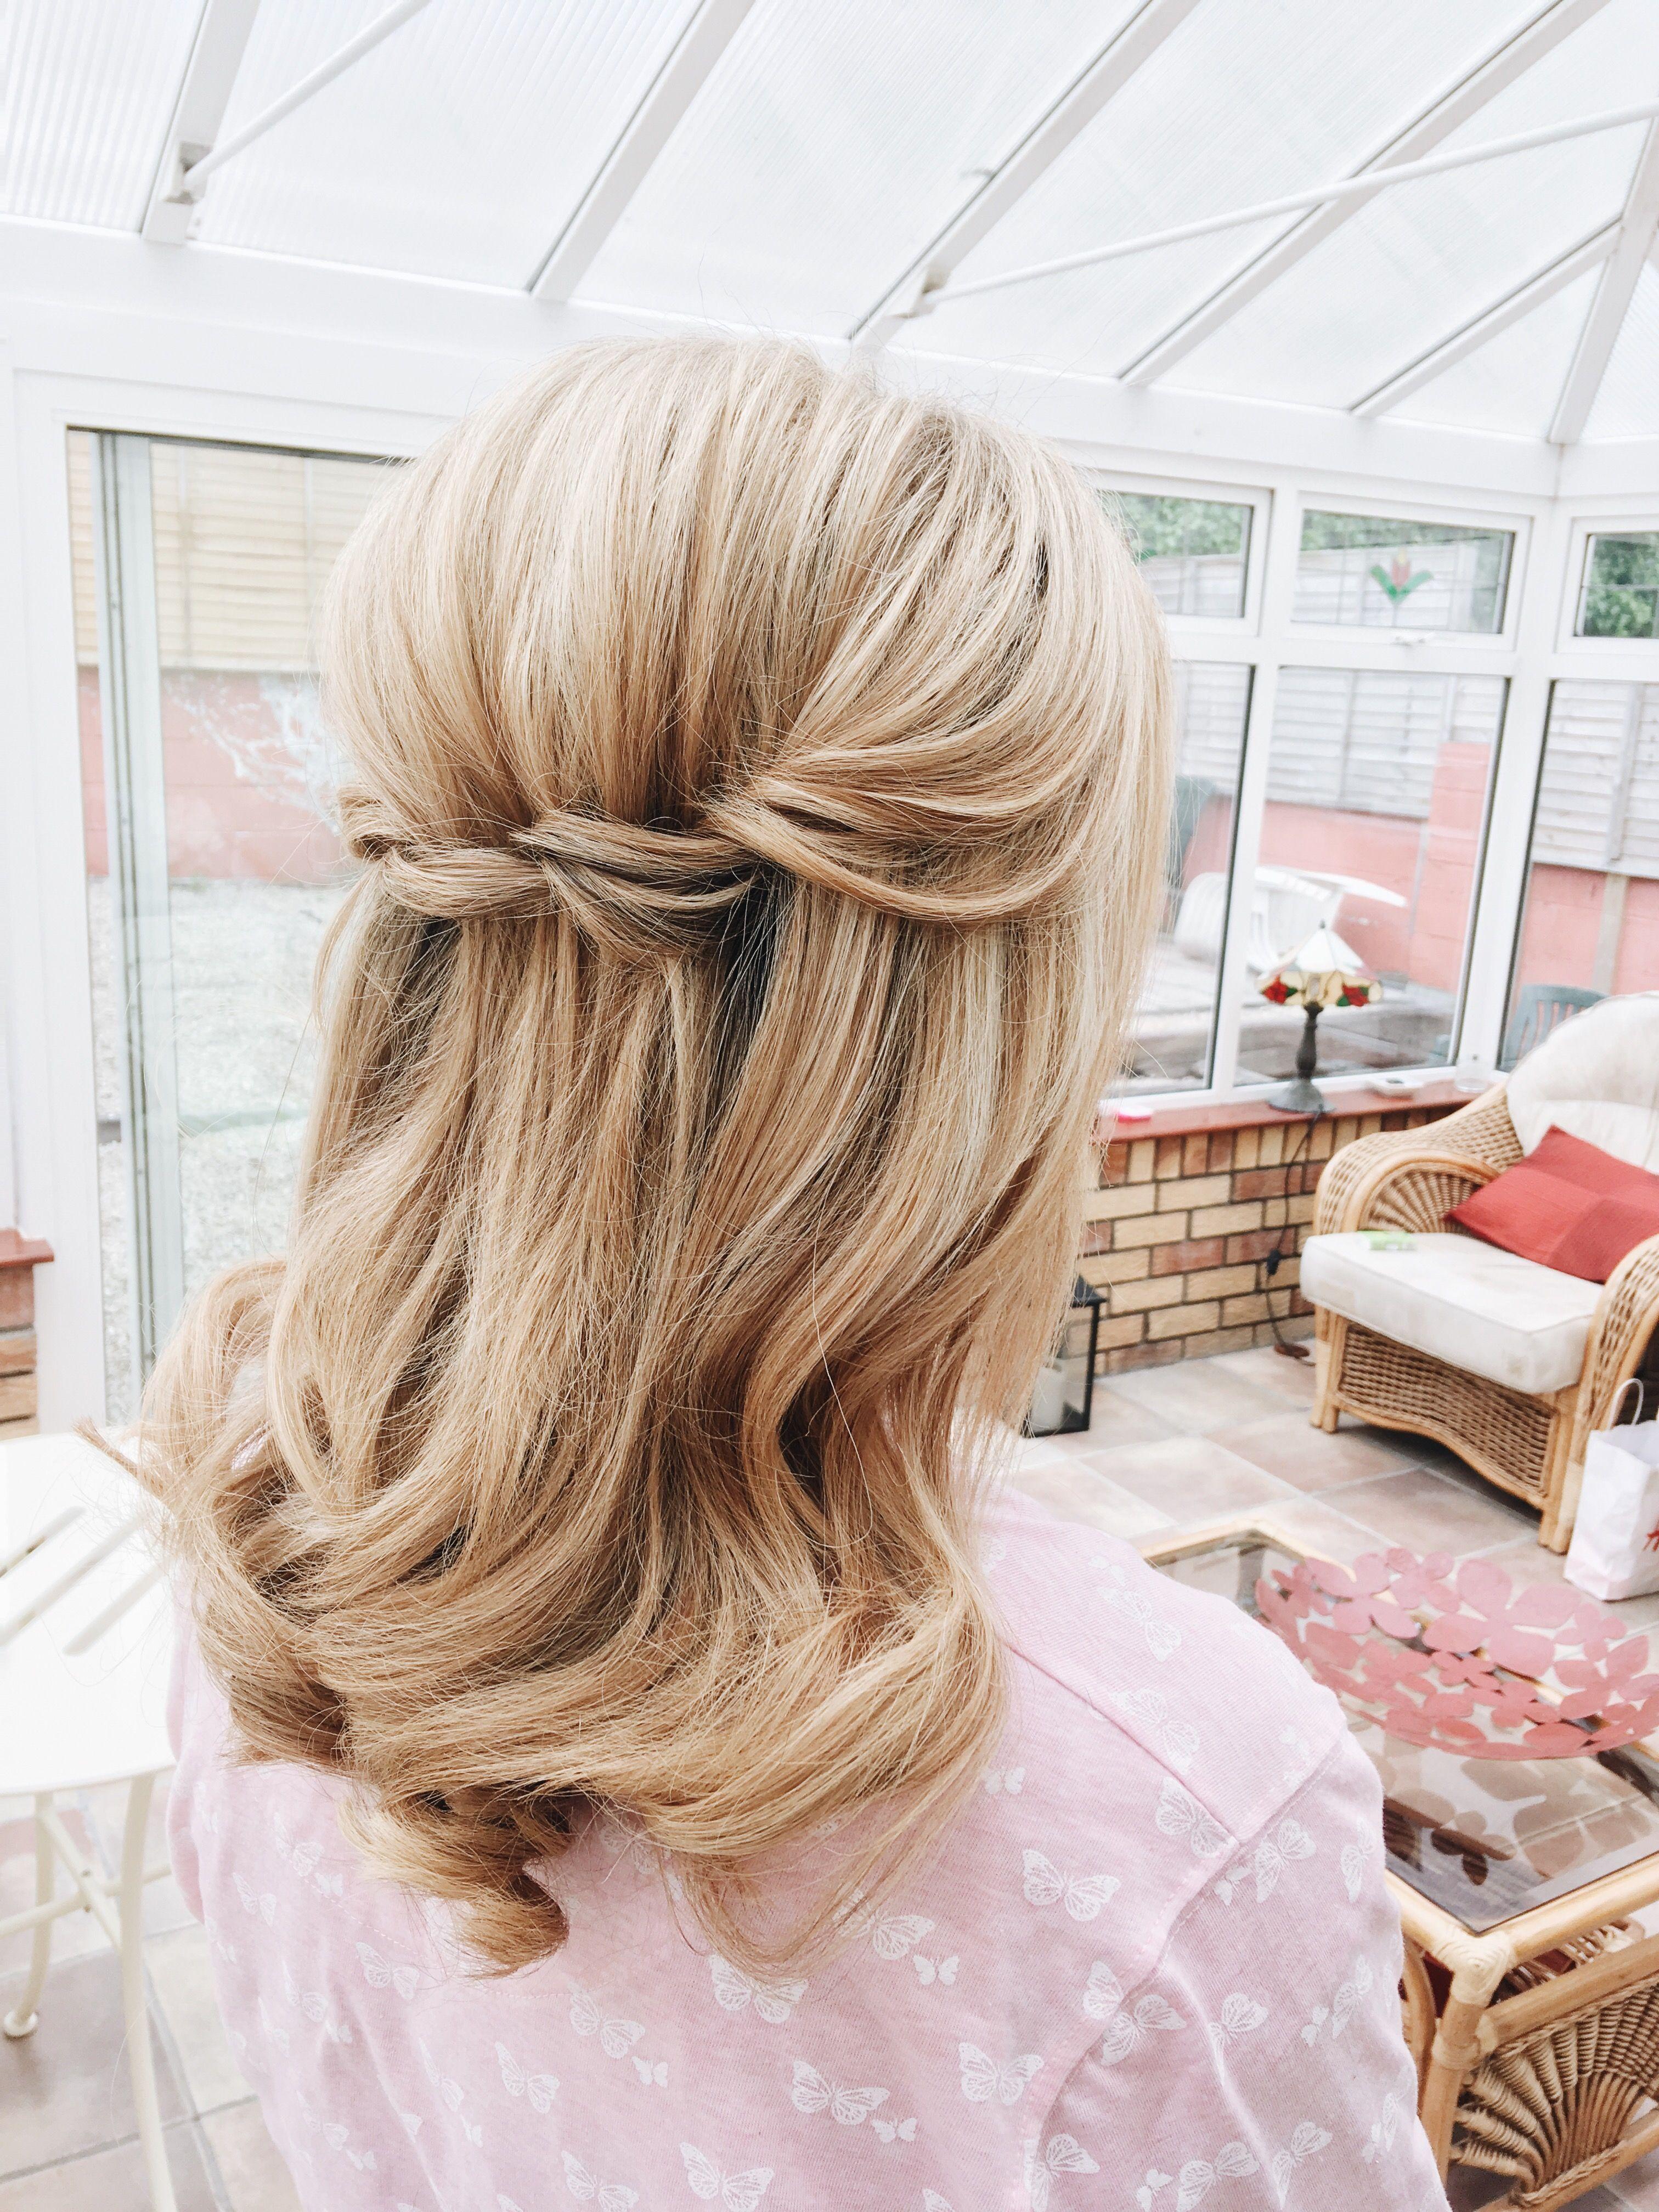 Half up wedding hairstyle weddinghairstyles hairstyles